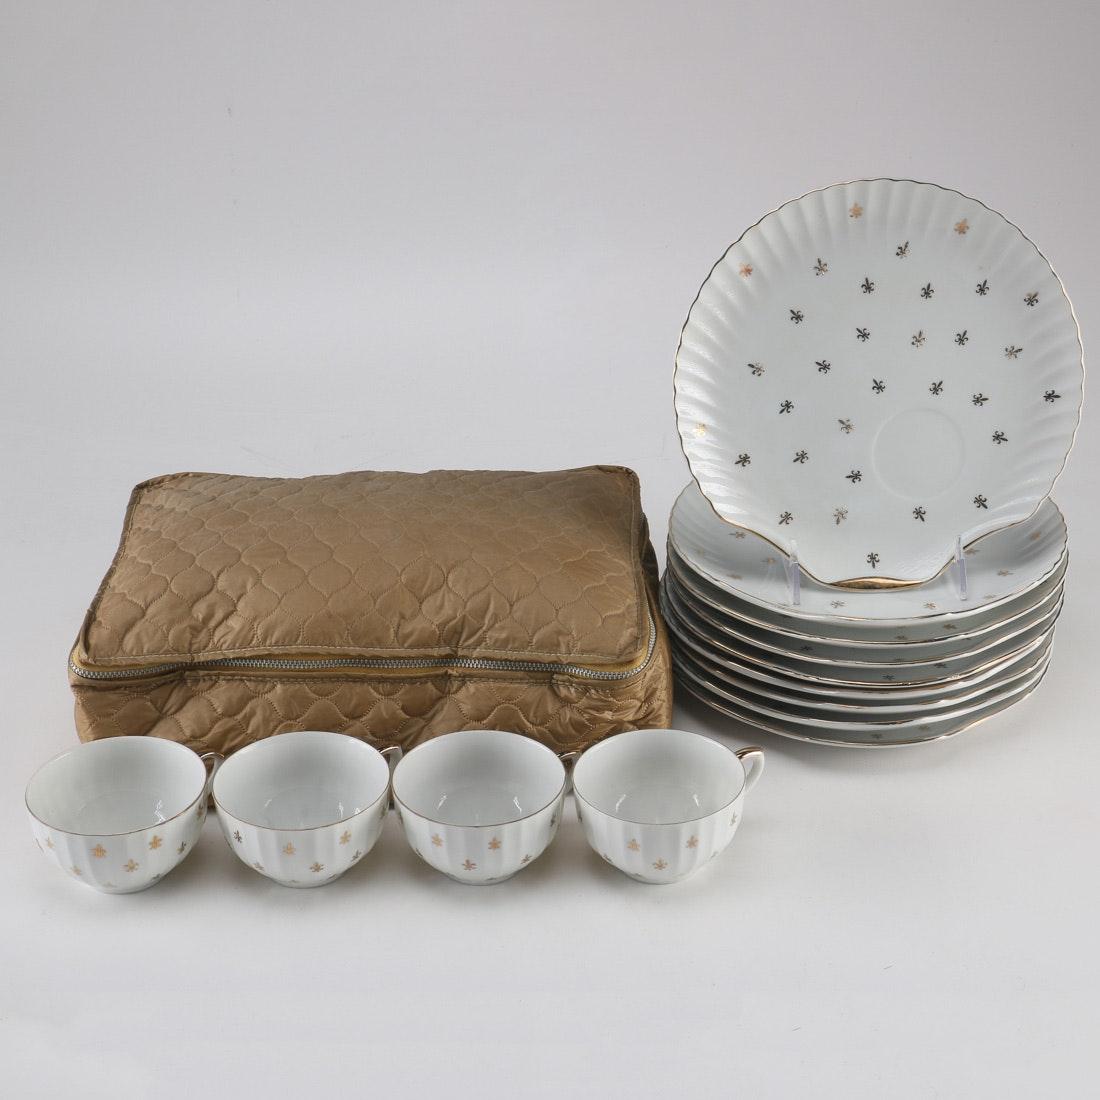 Lefton China Fleur De Lis Snack Plate and Cup Set ... & Lefton China Fleur De Lis Snack Plate and Cup Set : EBTH